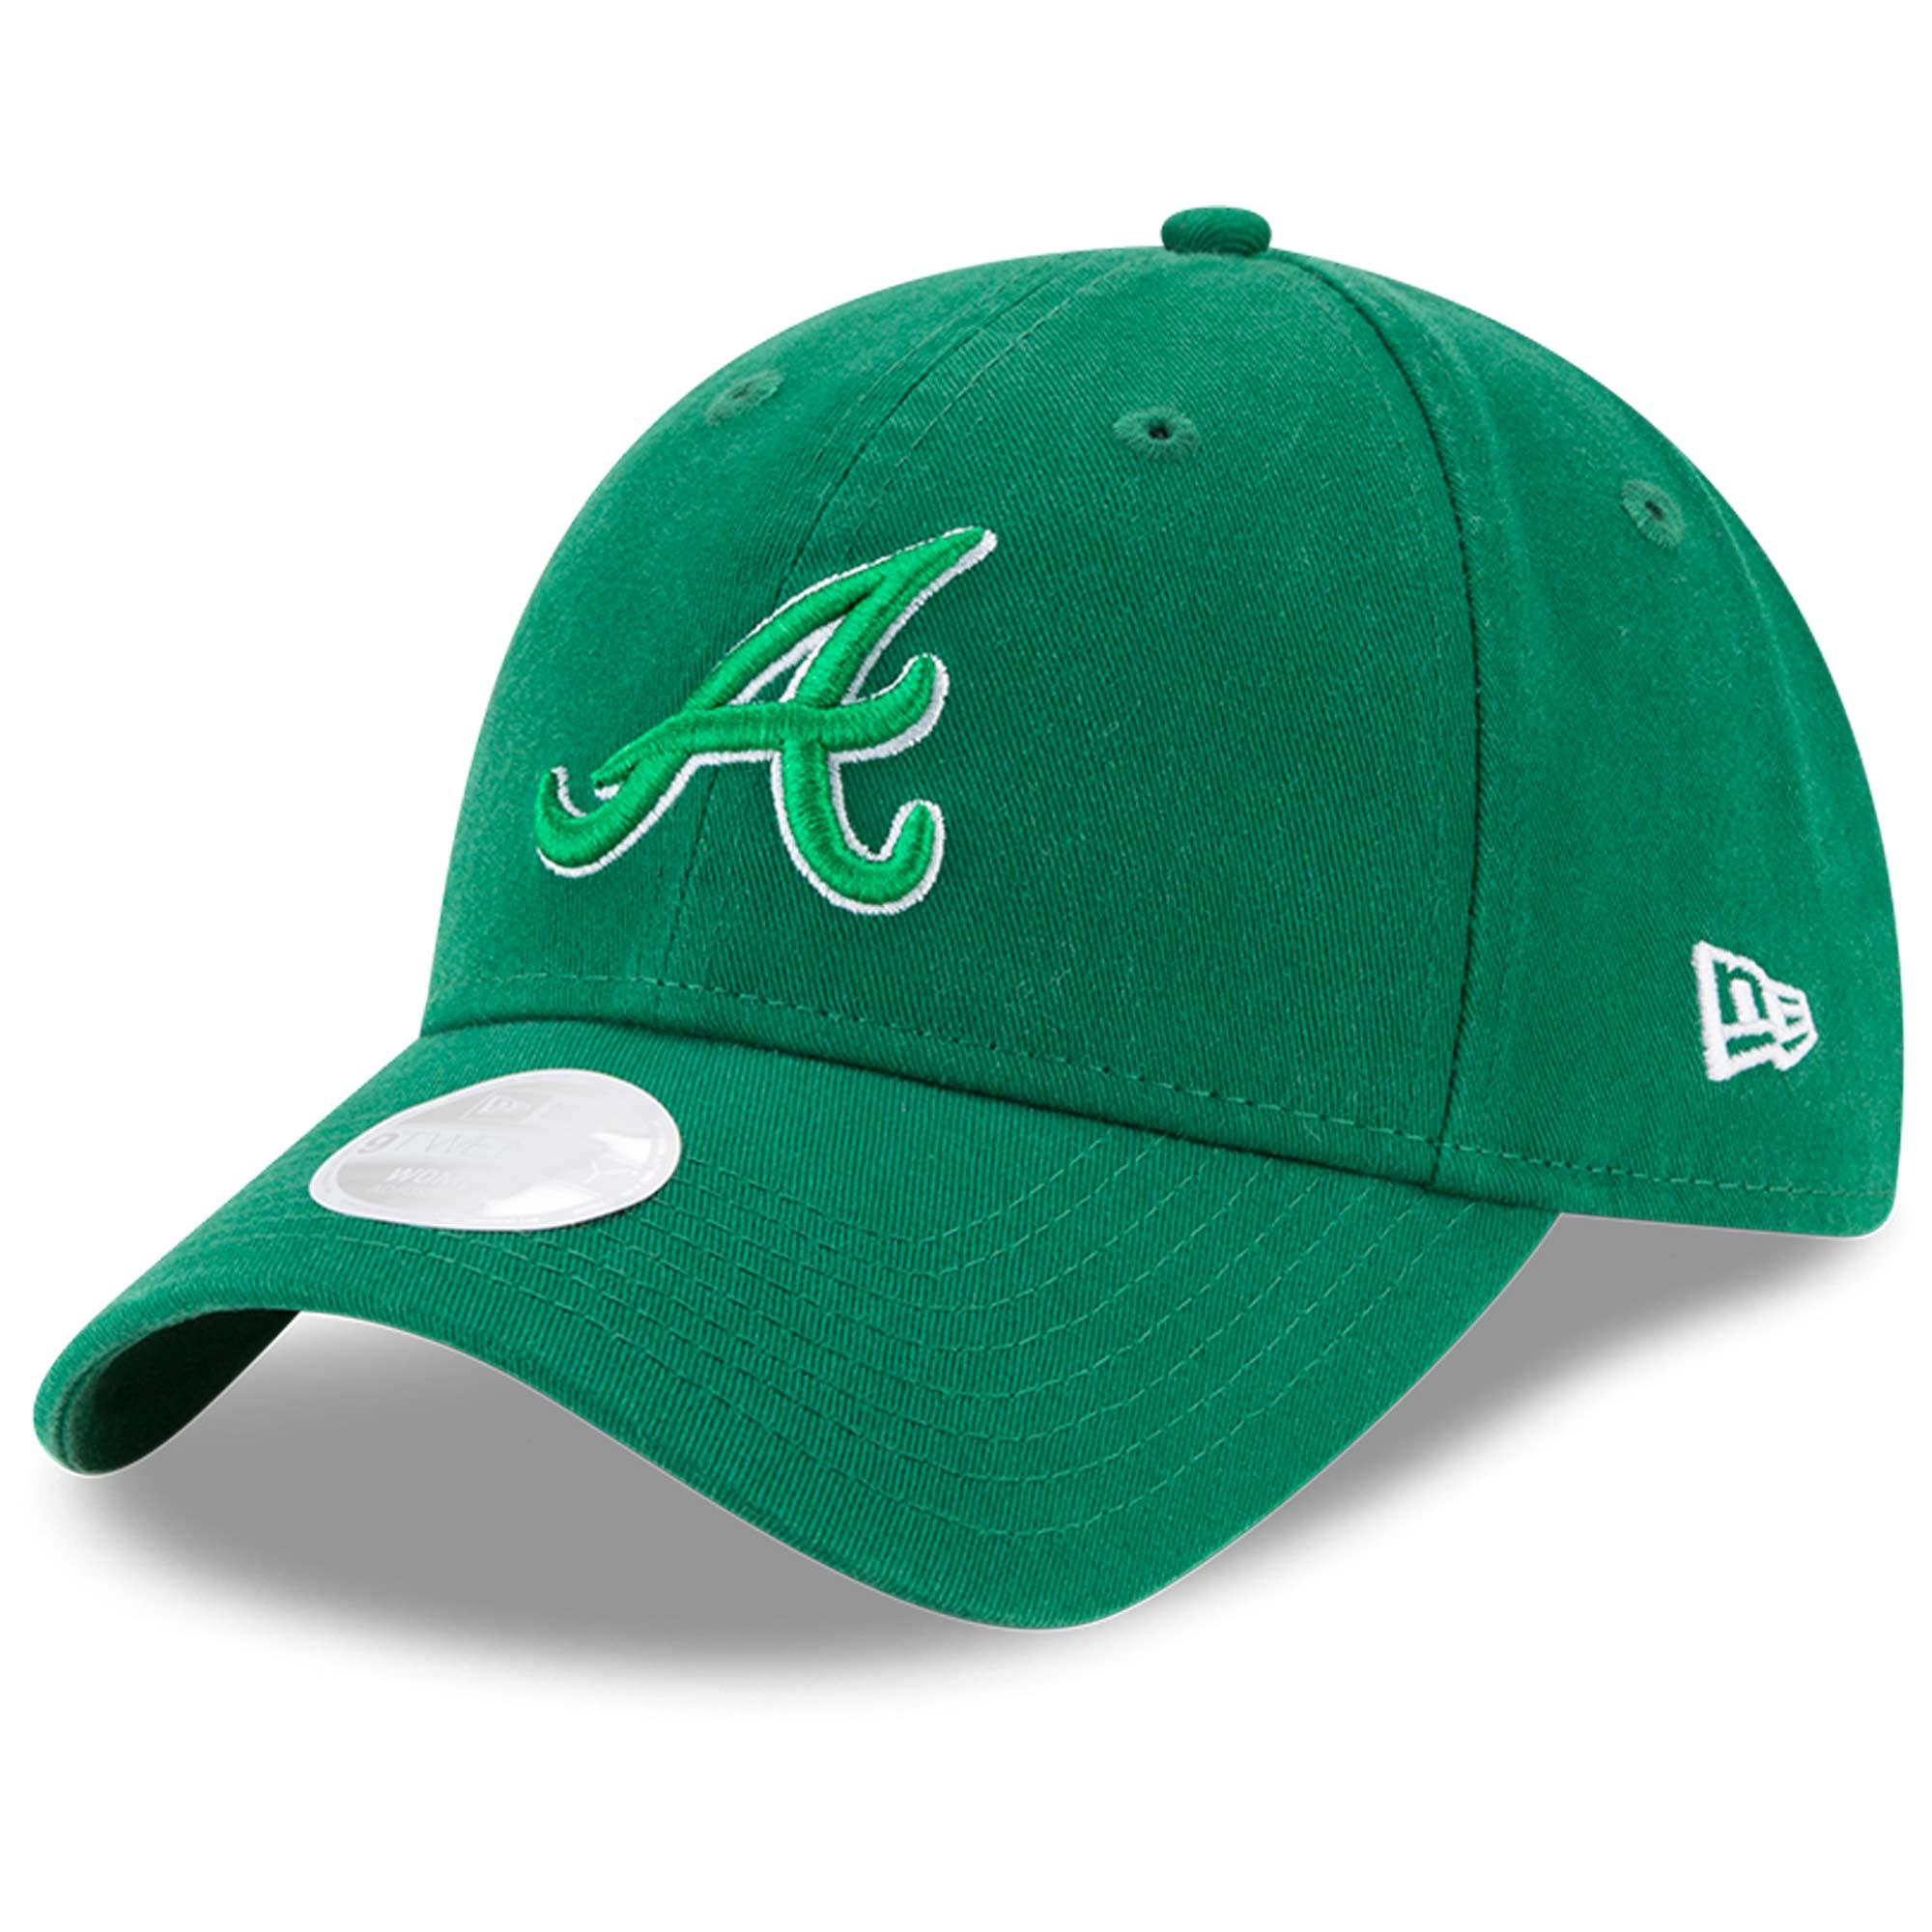 Atlanta Braves New Era Women's Core Classic Twill St. Patrick's Day 9TWENTY Adjustable Hat - Green - OSFA